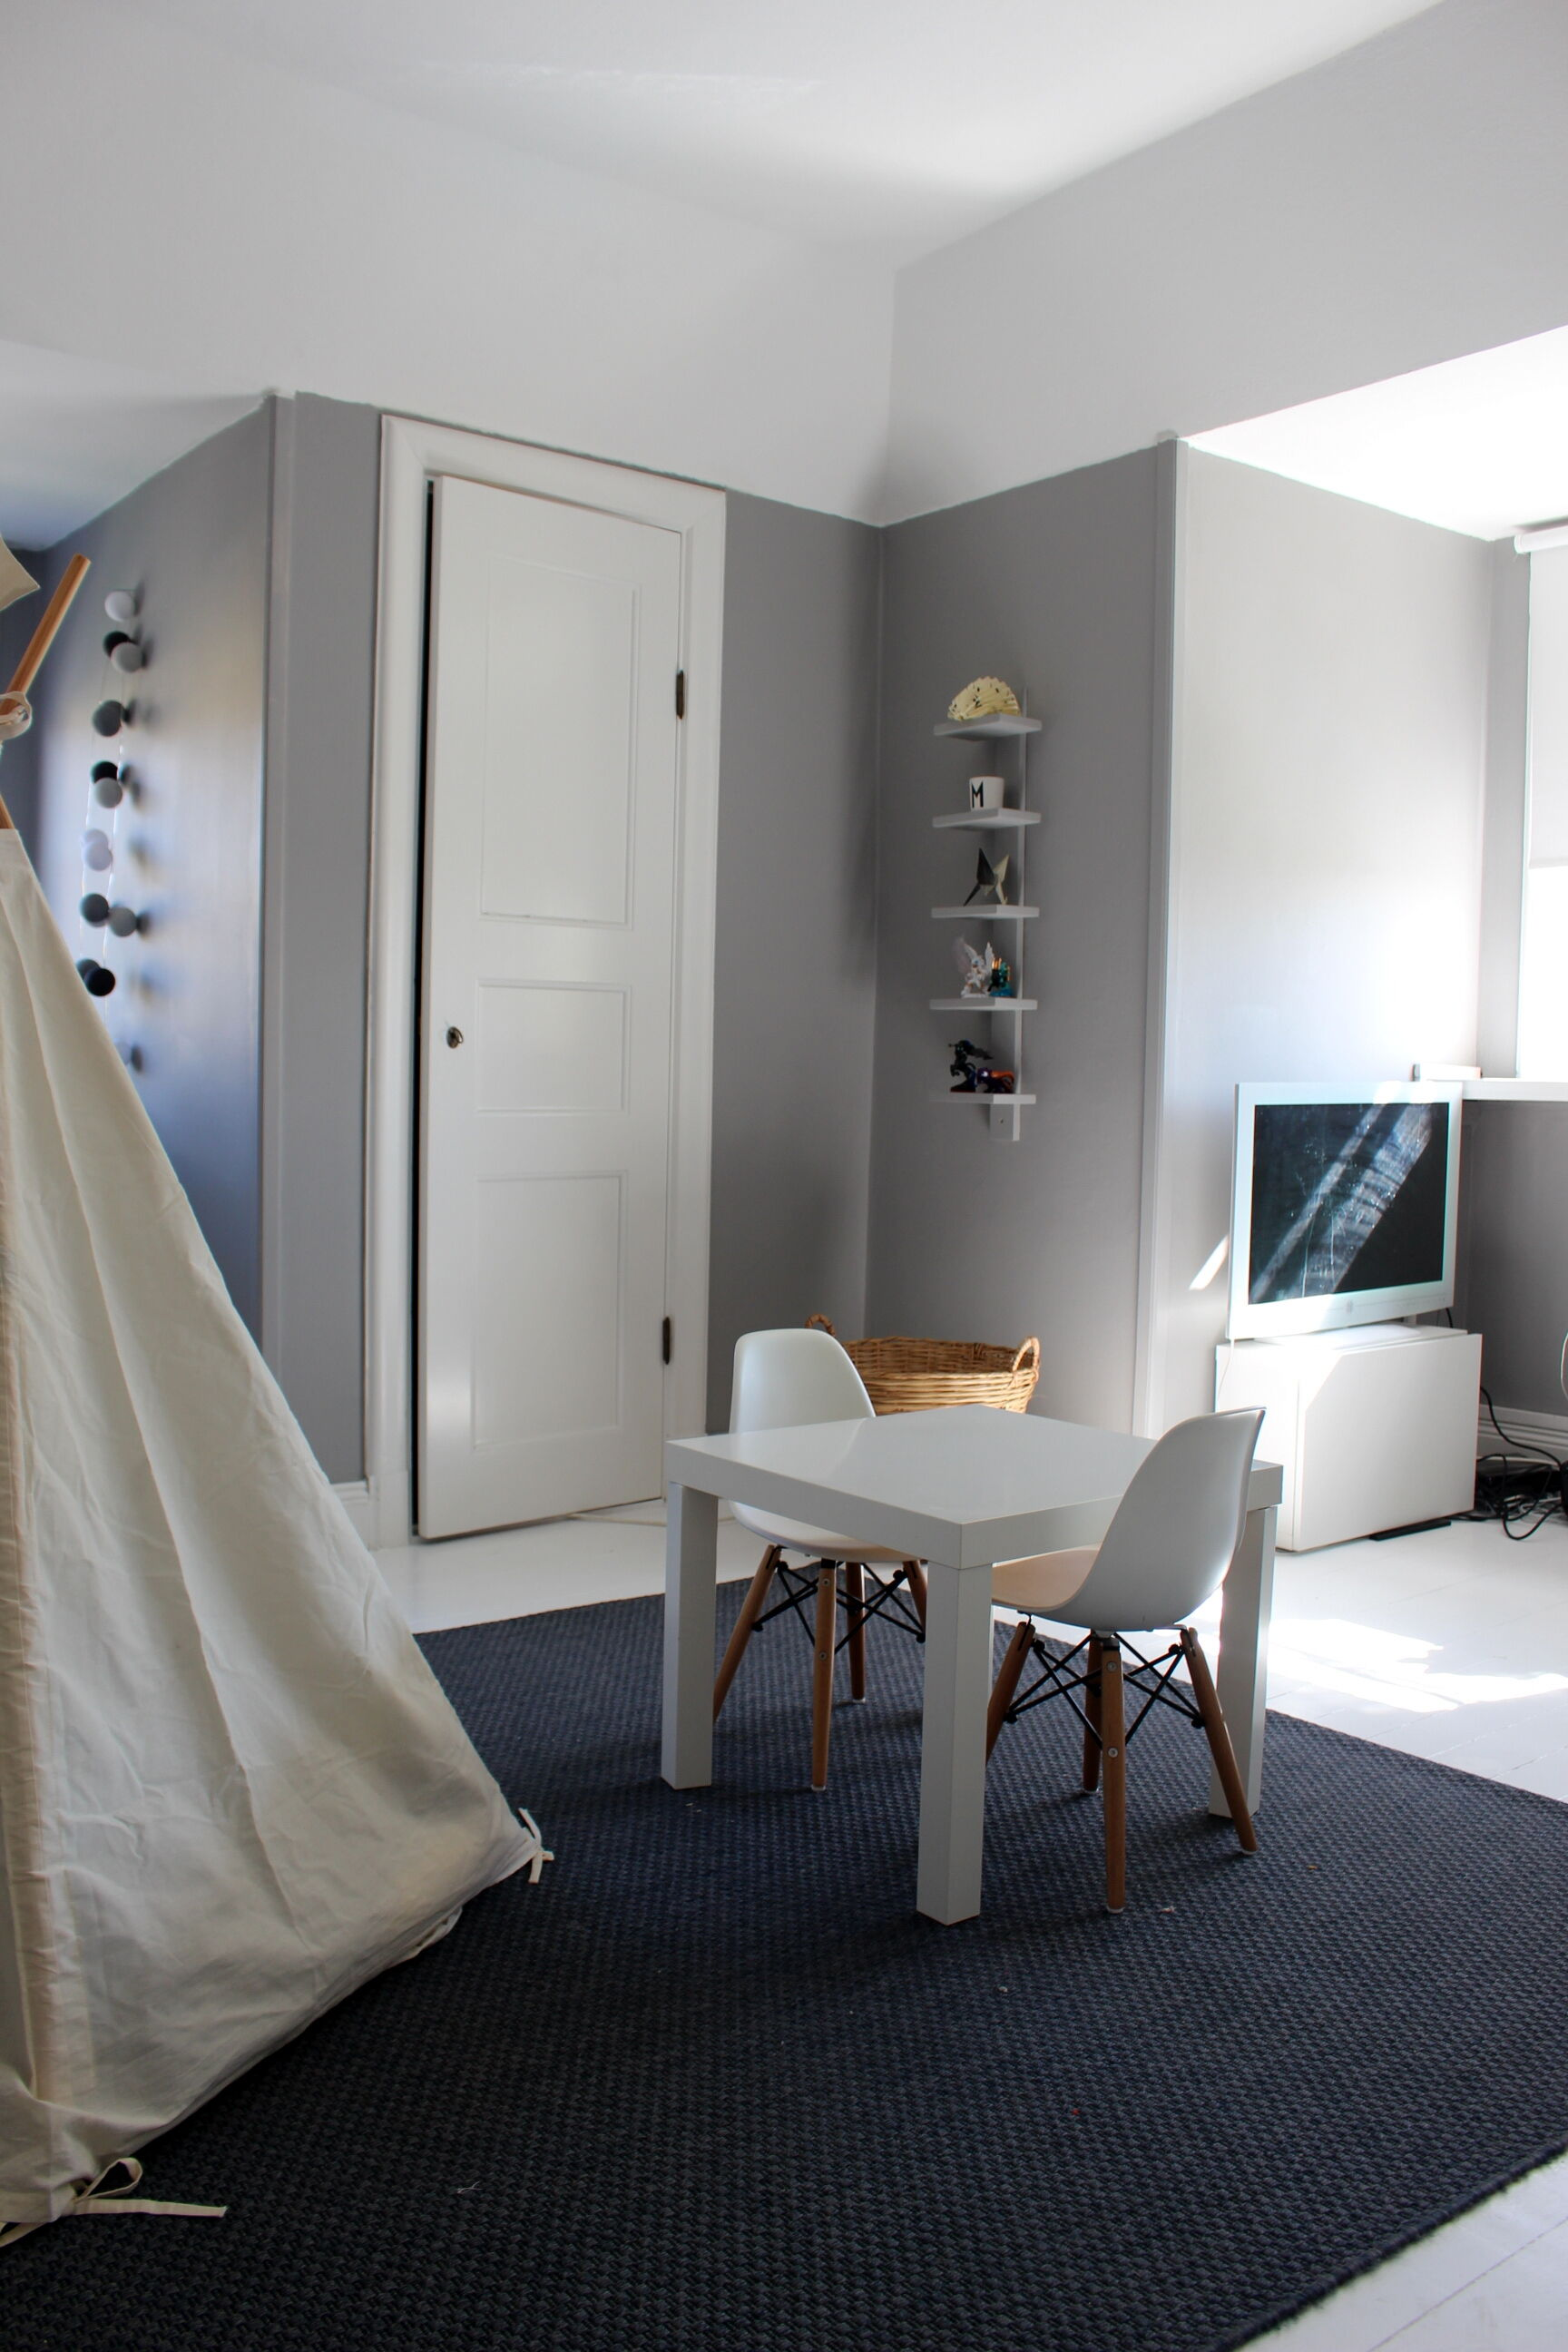 Ladda med stil | Starwoman Interior & Lifestyle by